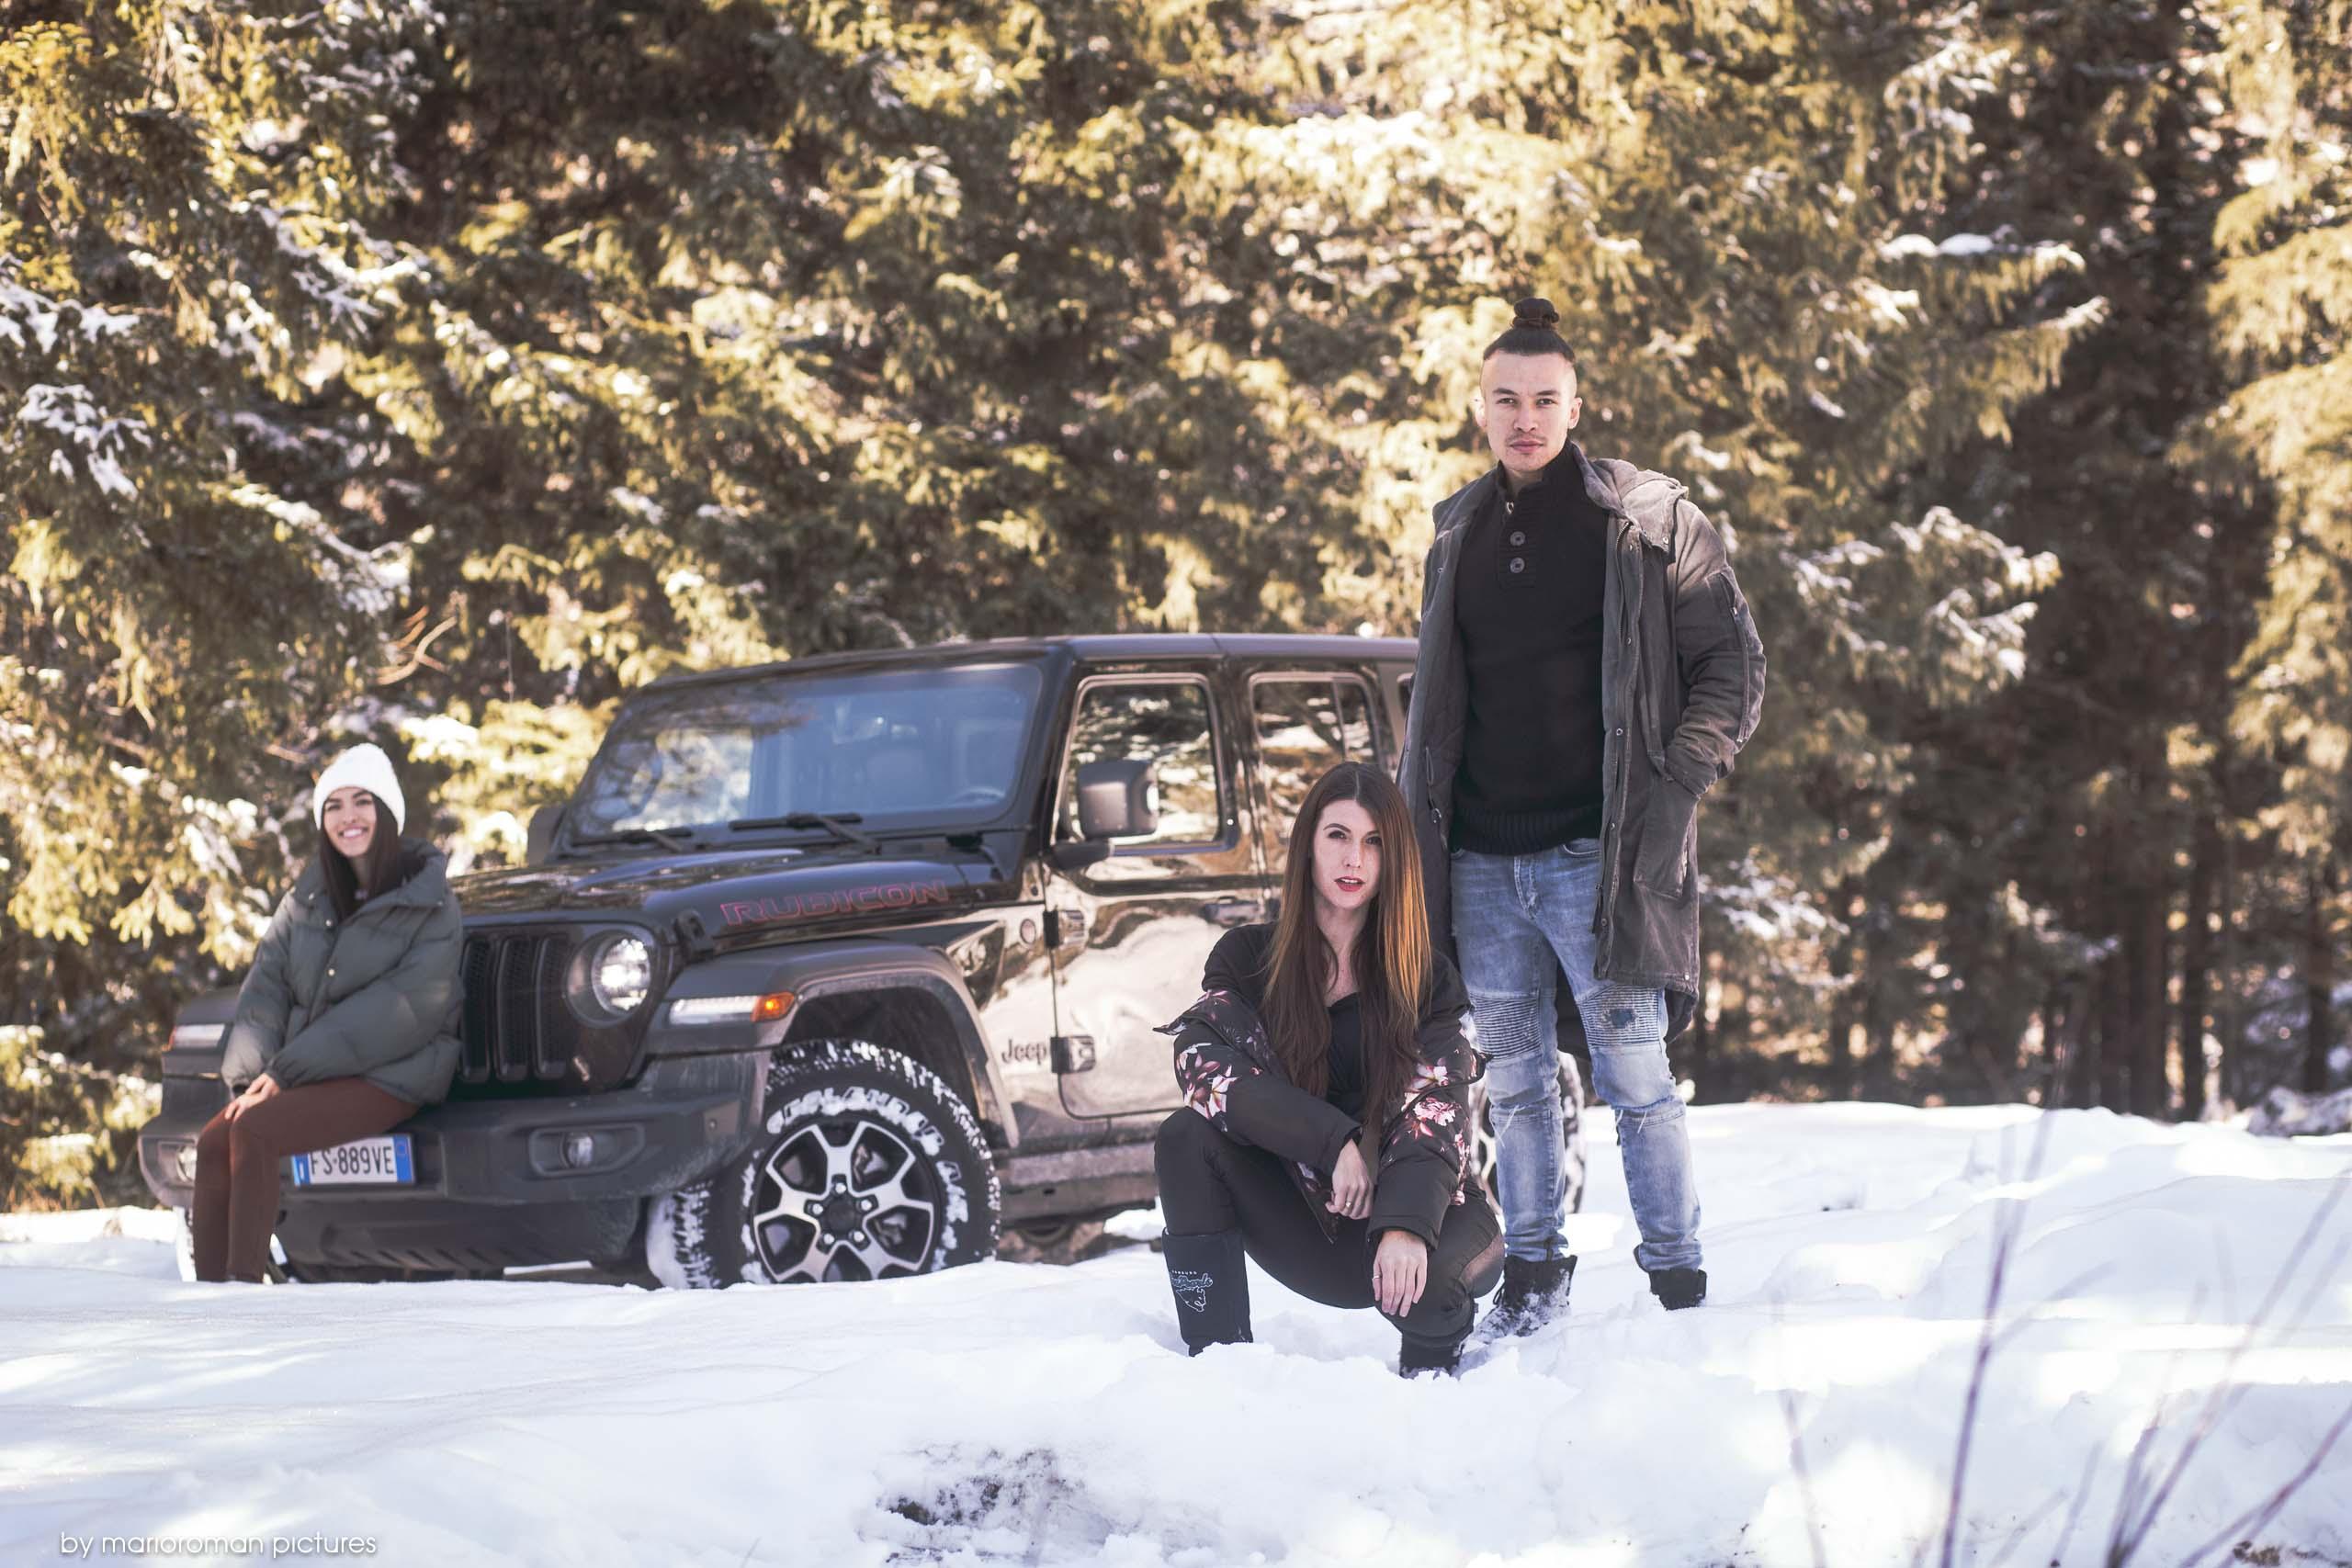 Jeep Winter Experience - MarioRomanPictures